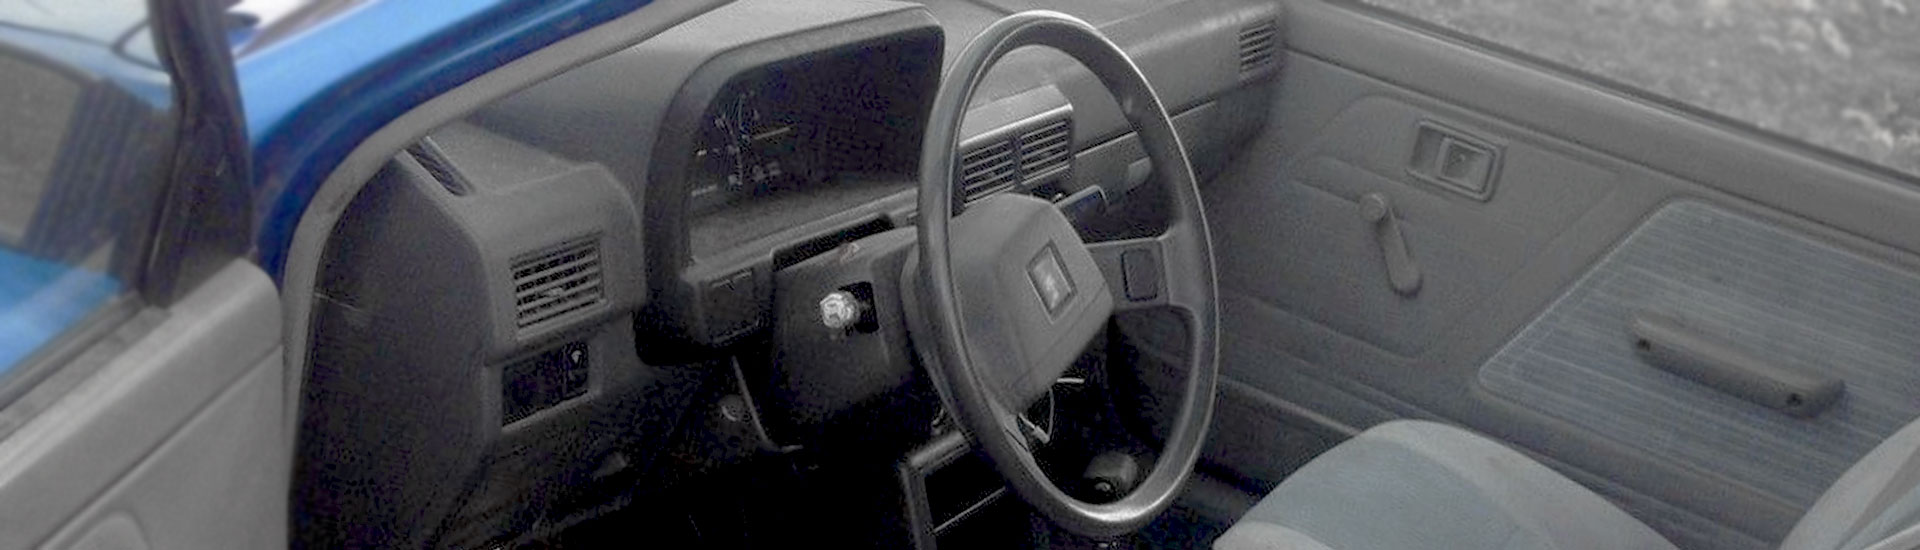 Ford Festiva Dash Kits | Custom Ford Festiva Dash Kit